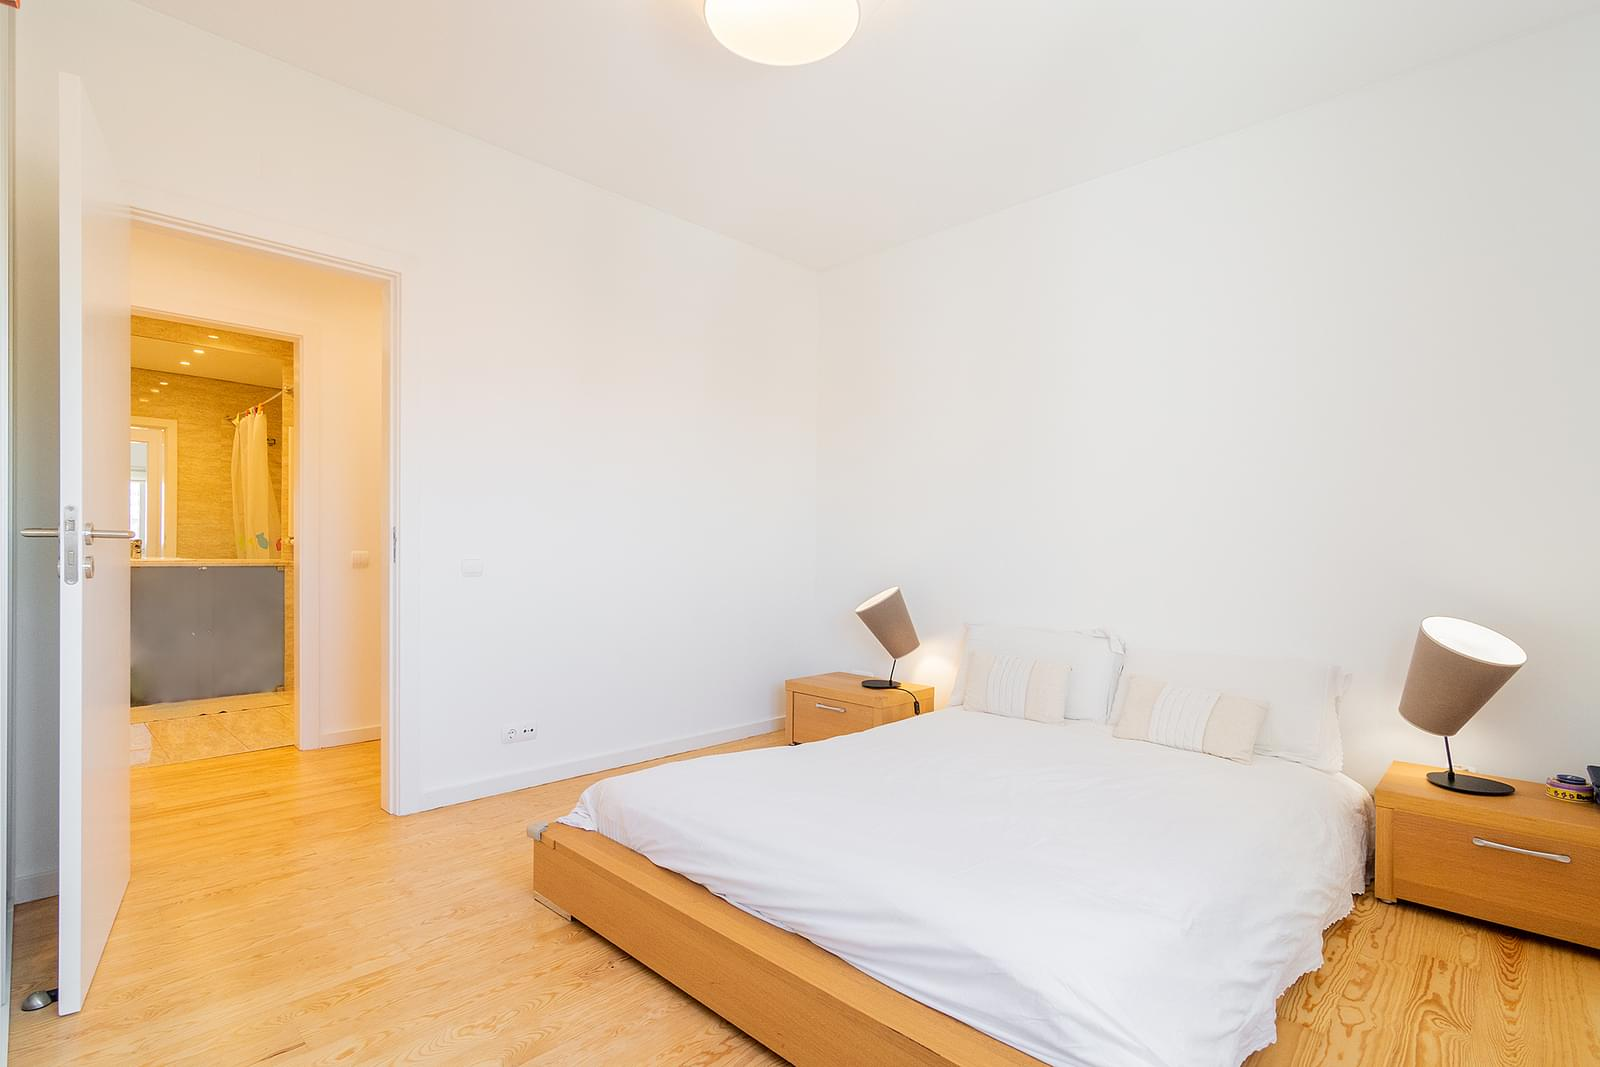 pf14147-apartamento-t3-lisboa-065f8ff4-7391-4808-9cf4-6aa519a7bacf